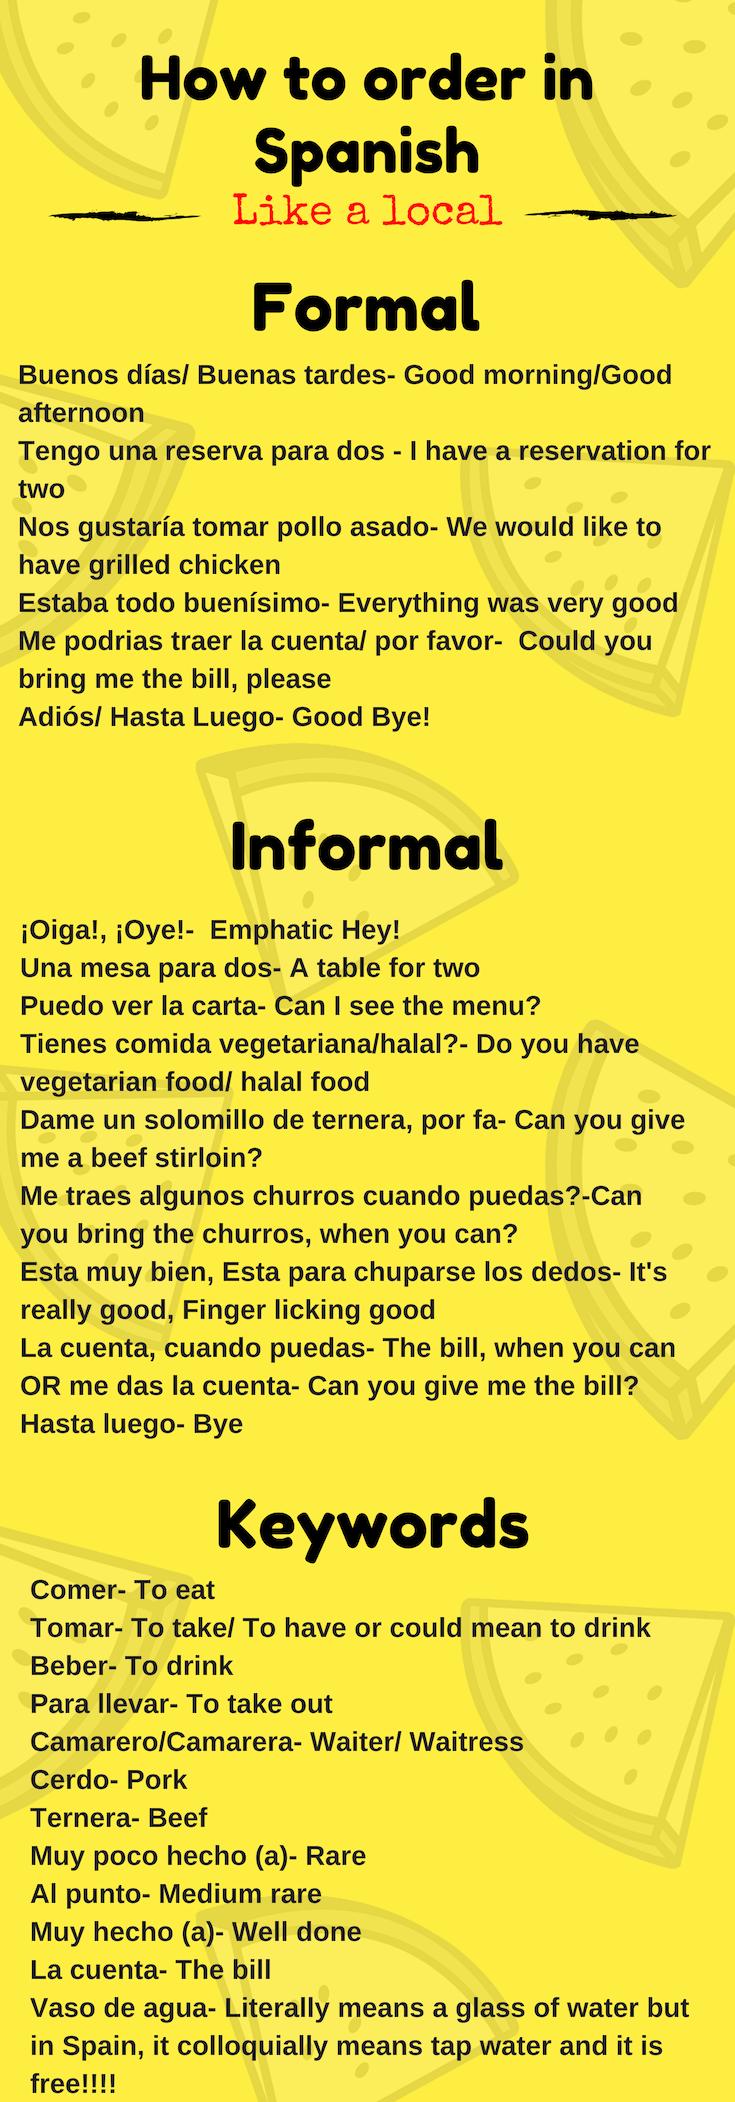 Ordering Food In Spanish Like A Local Aprender Espanol Aula De Espanol Espanol